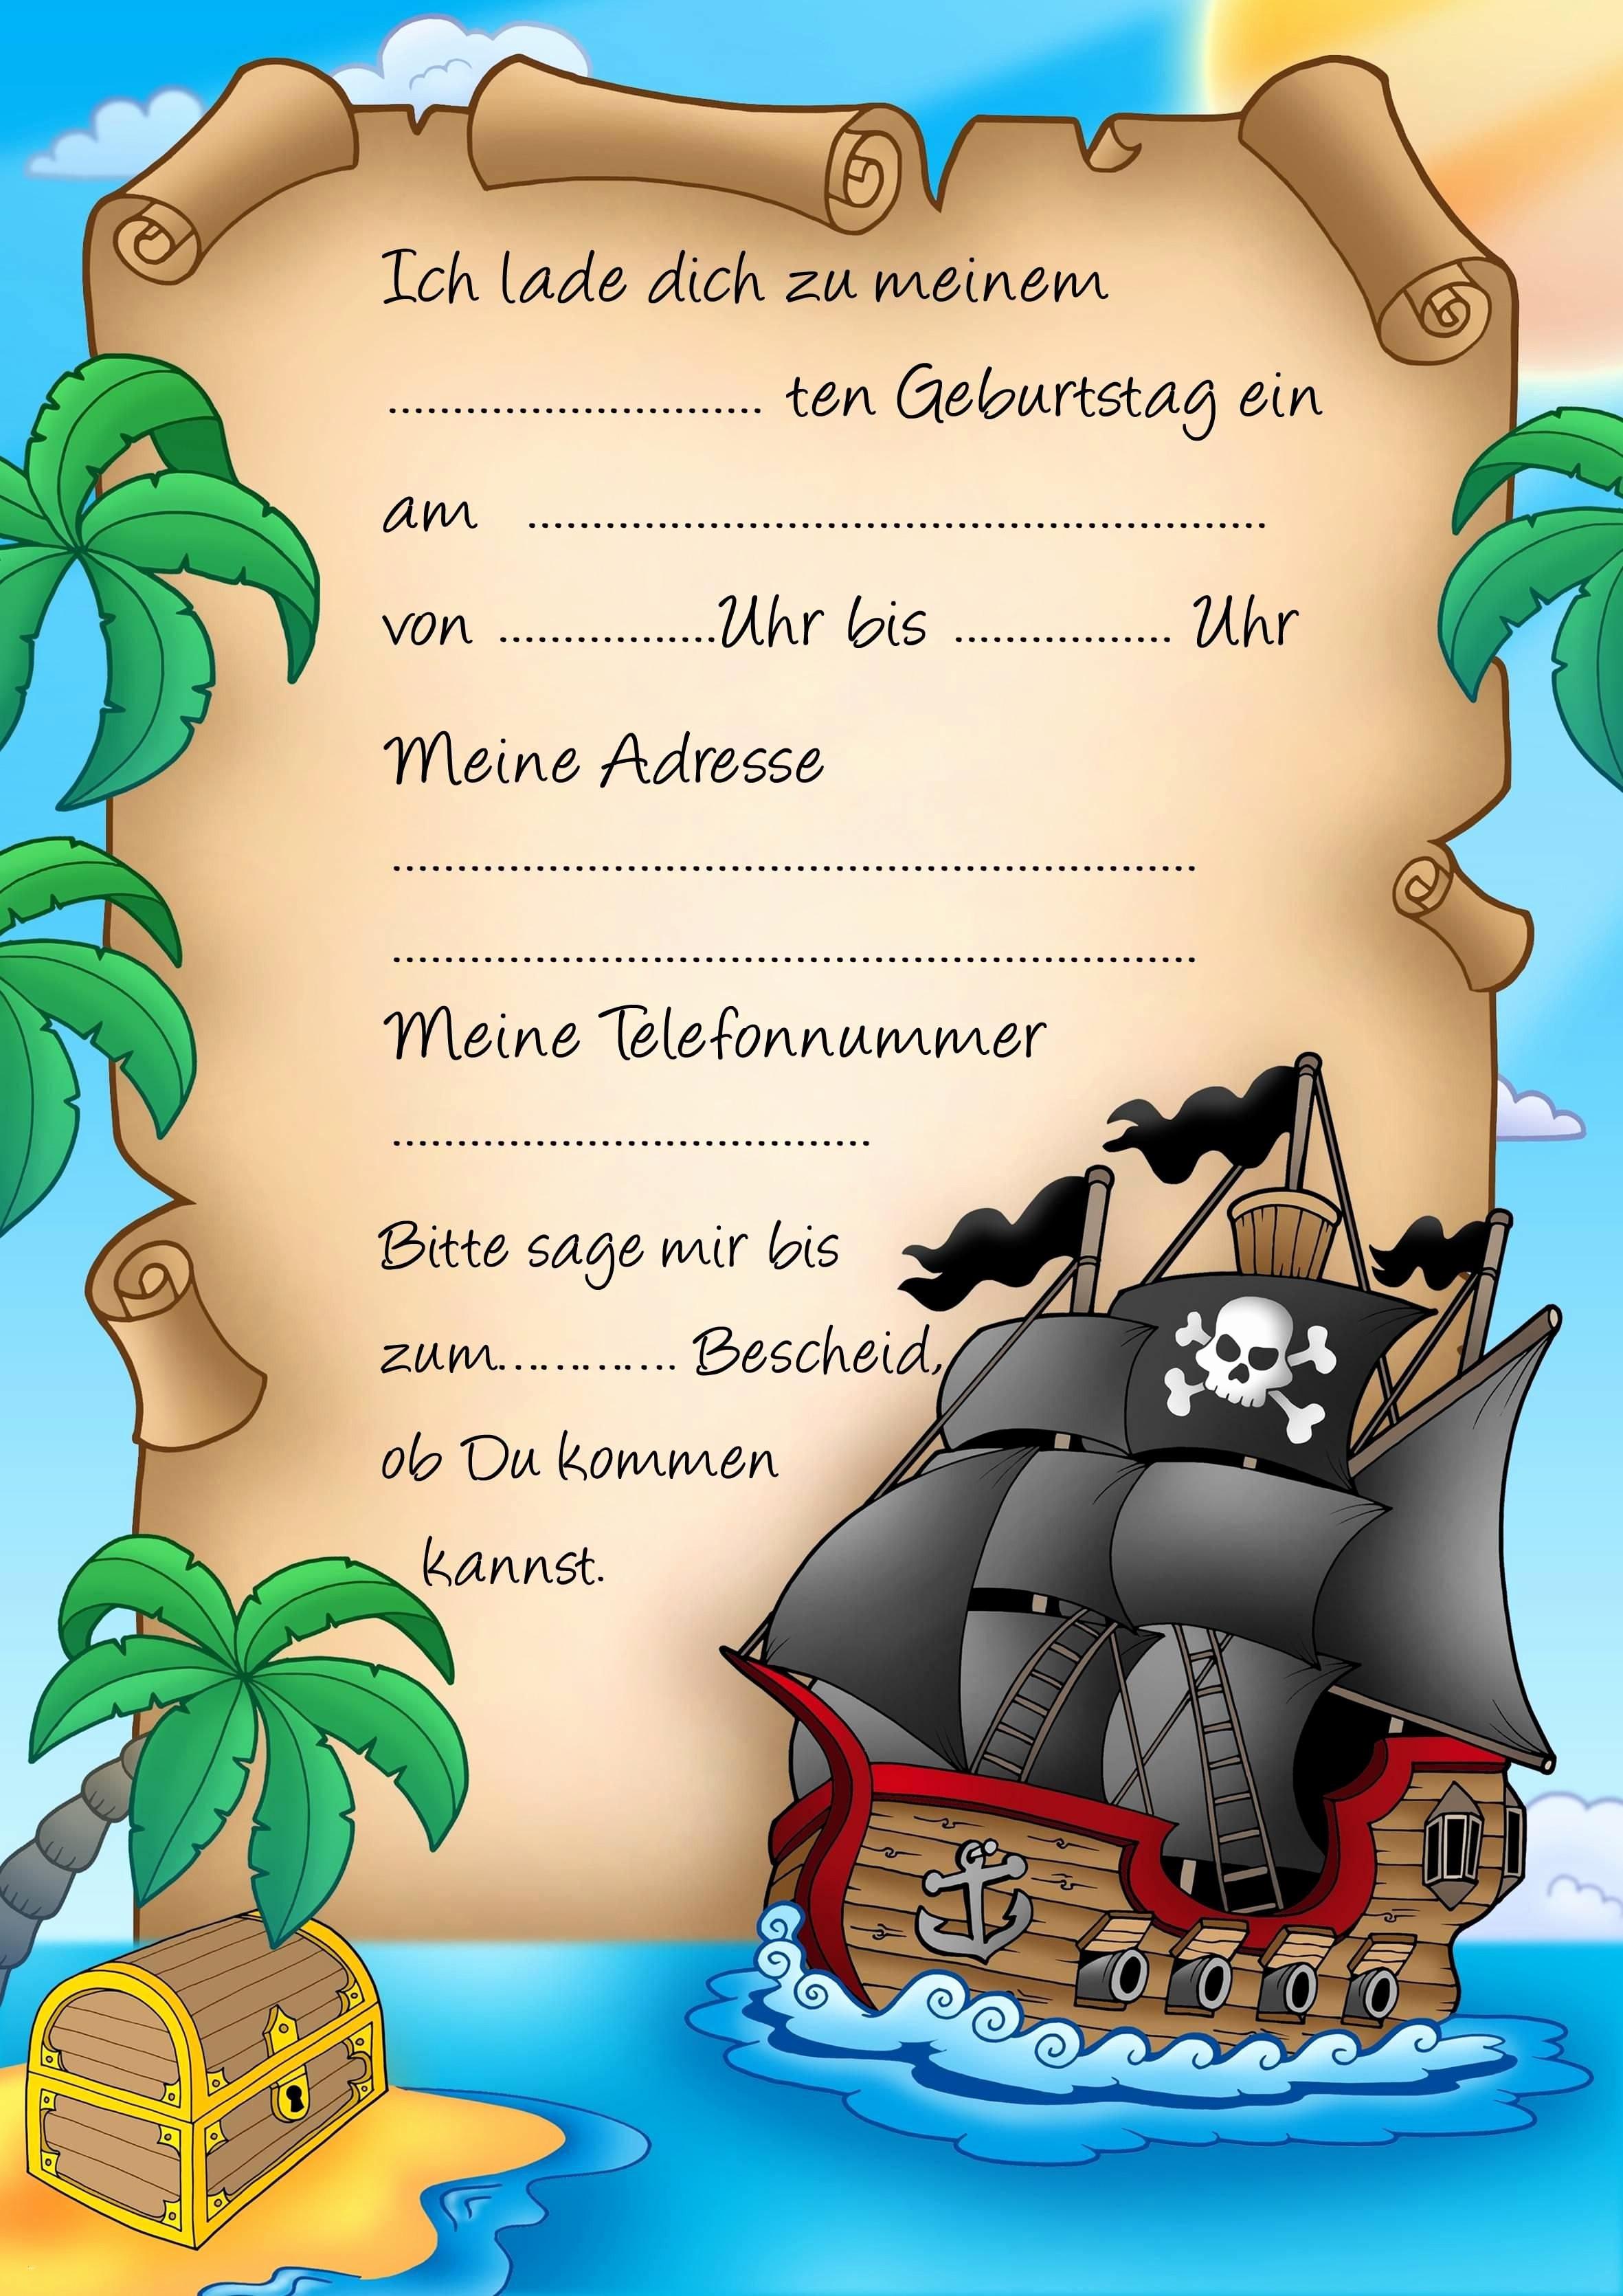 Fc Bayern Logo Zum Ausdrucken Genial Fc Bayern Logo Zum Ausdrucken Galerien Einladungskarten Fotos